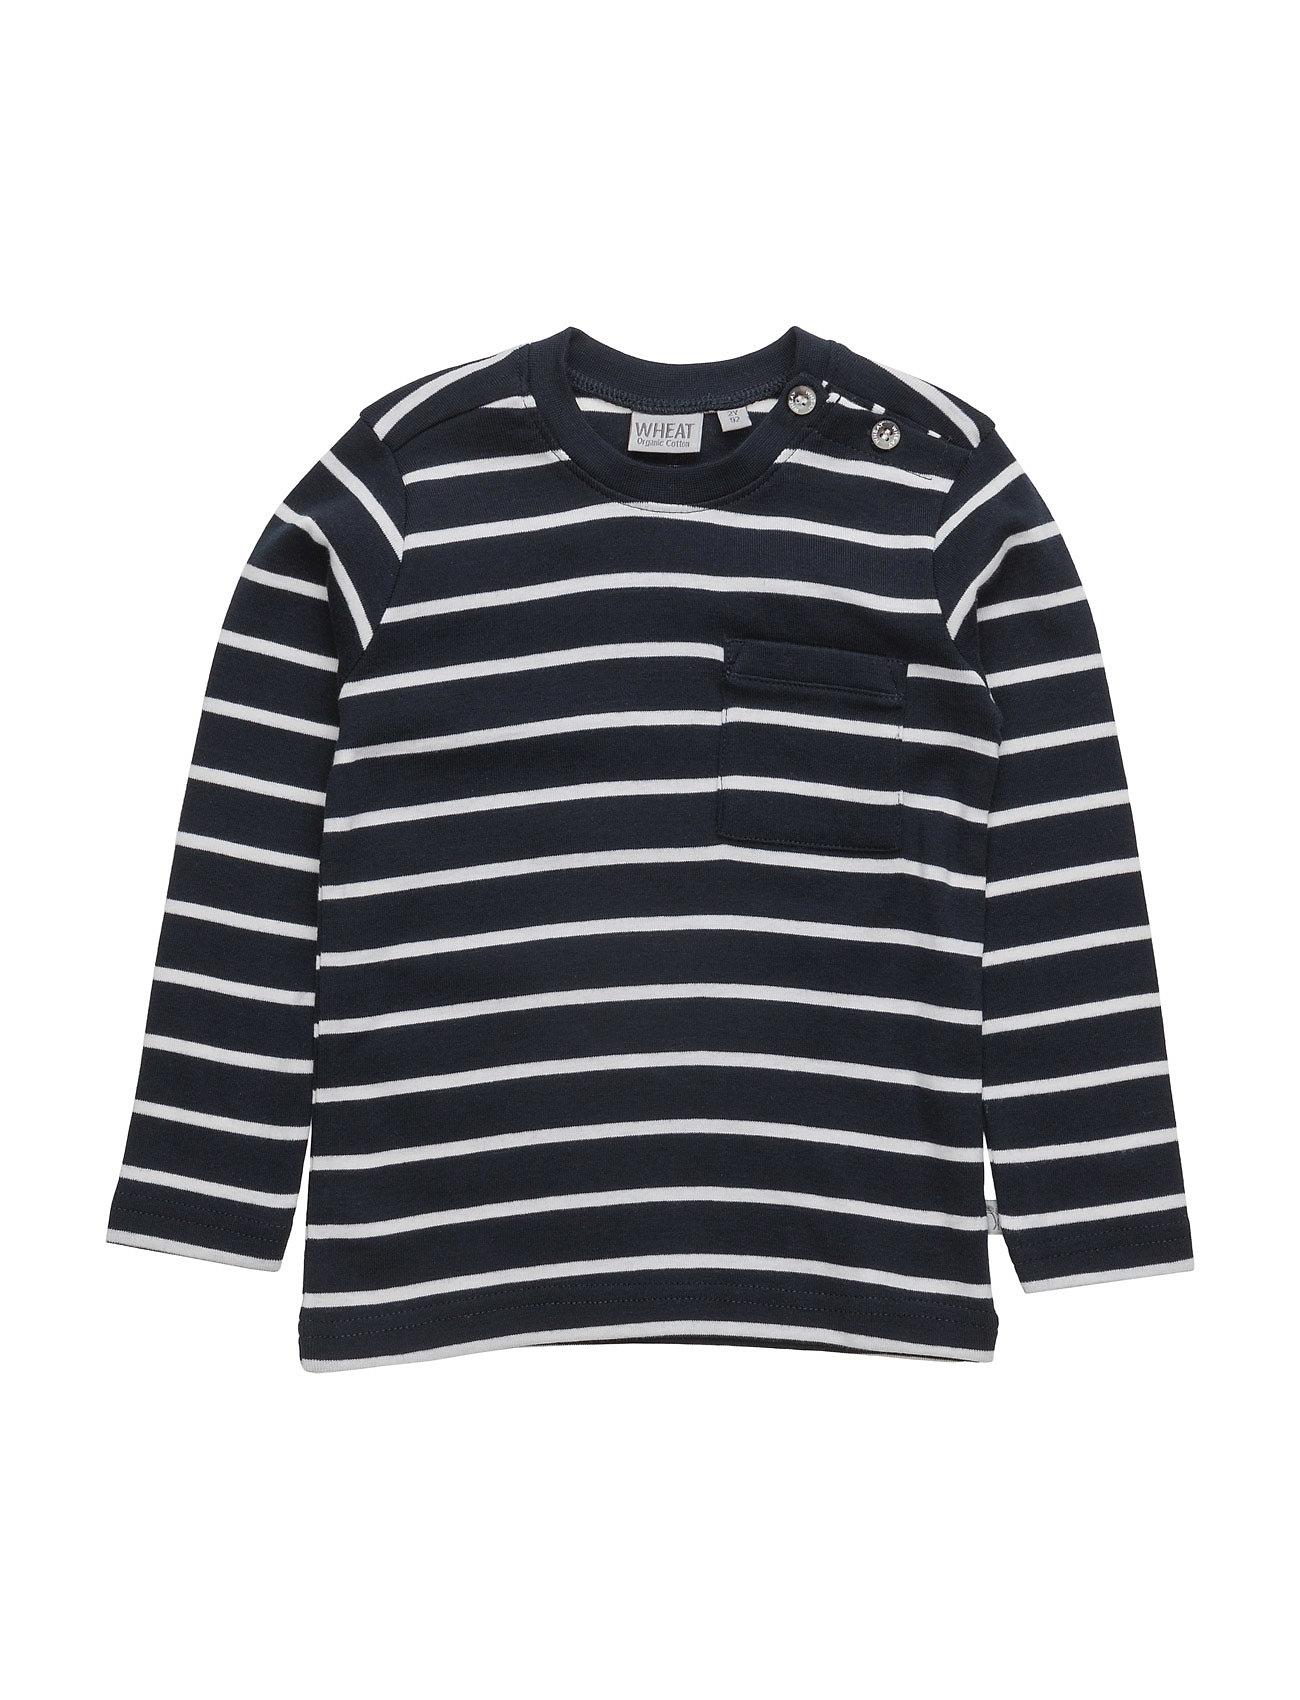 Wheat T-Shirt Jesper LS